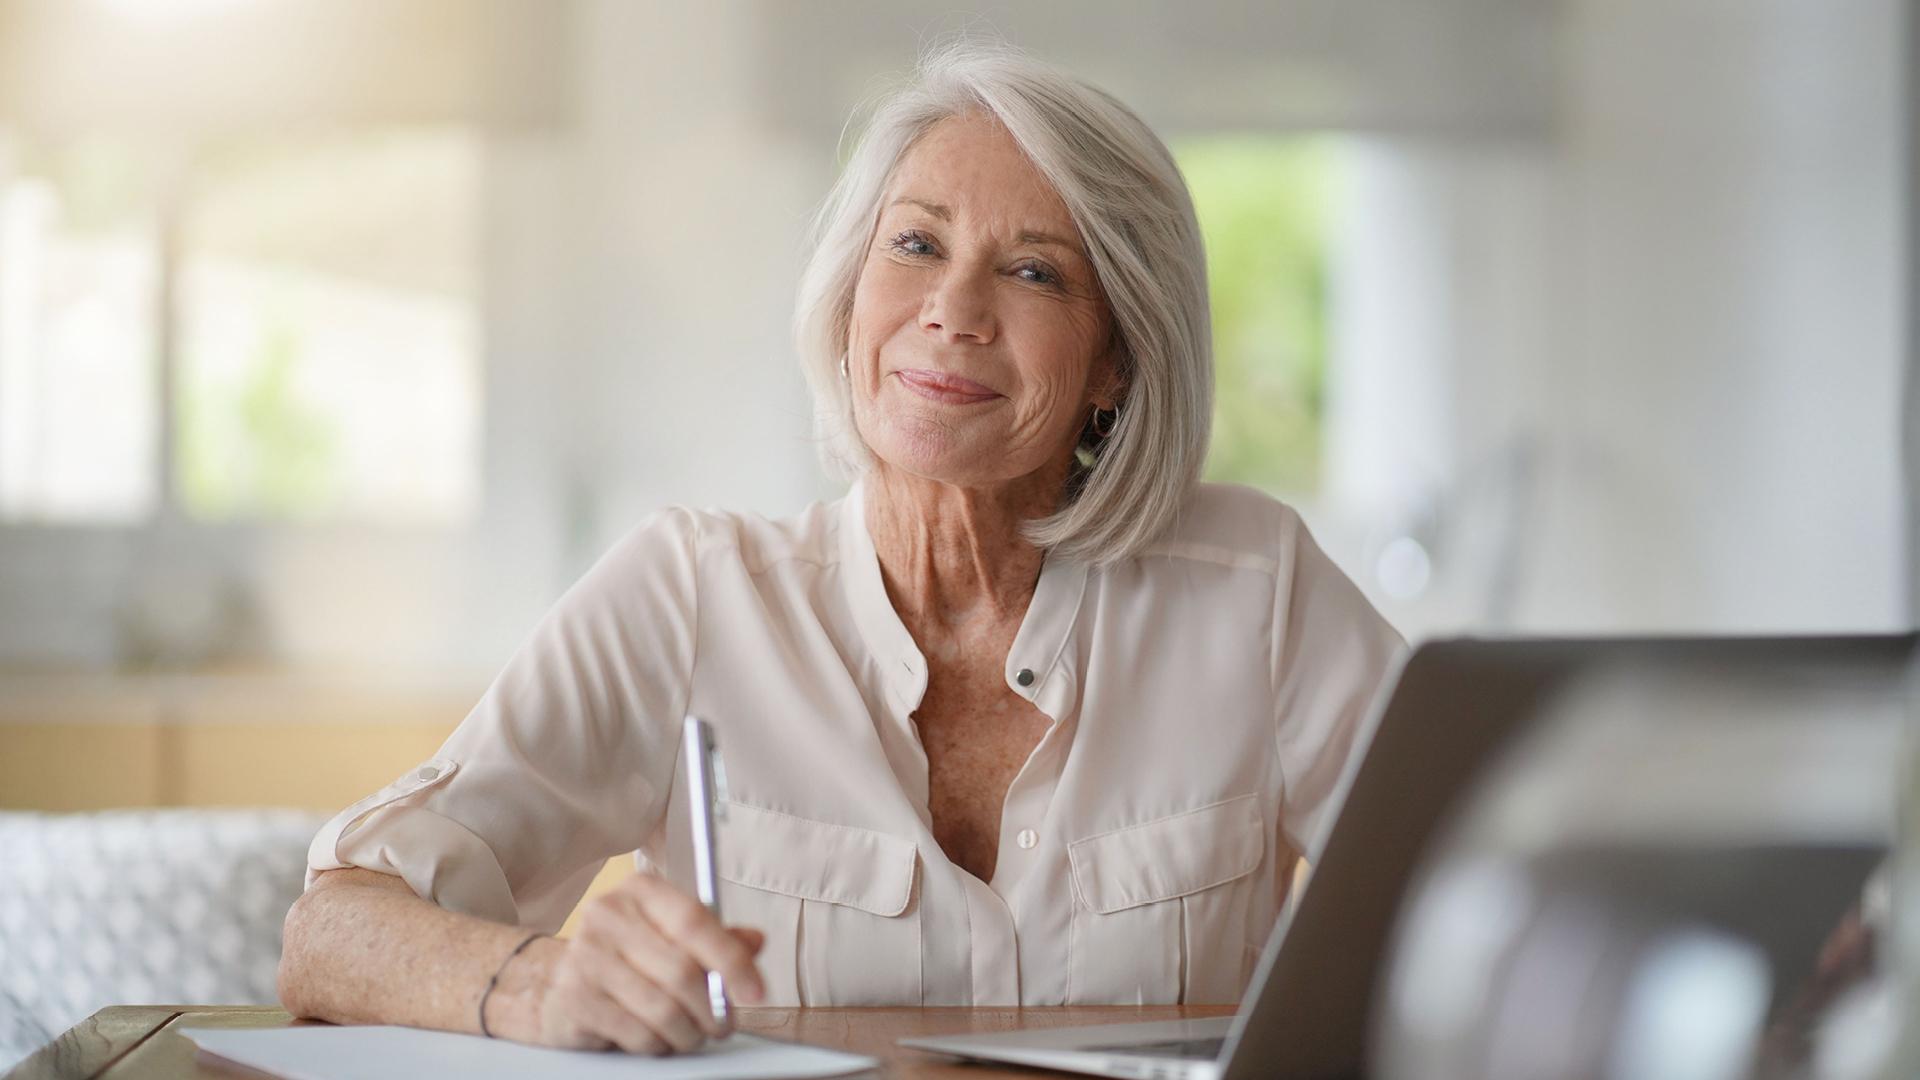 mature woman writing on paper at a desk looking at camera